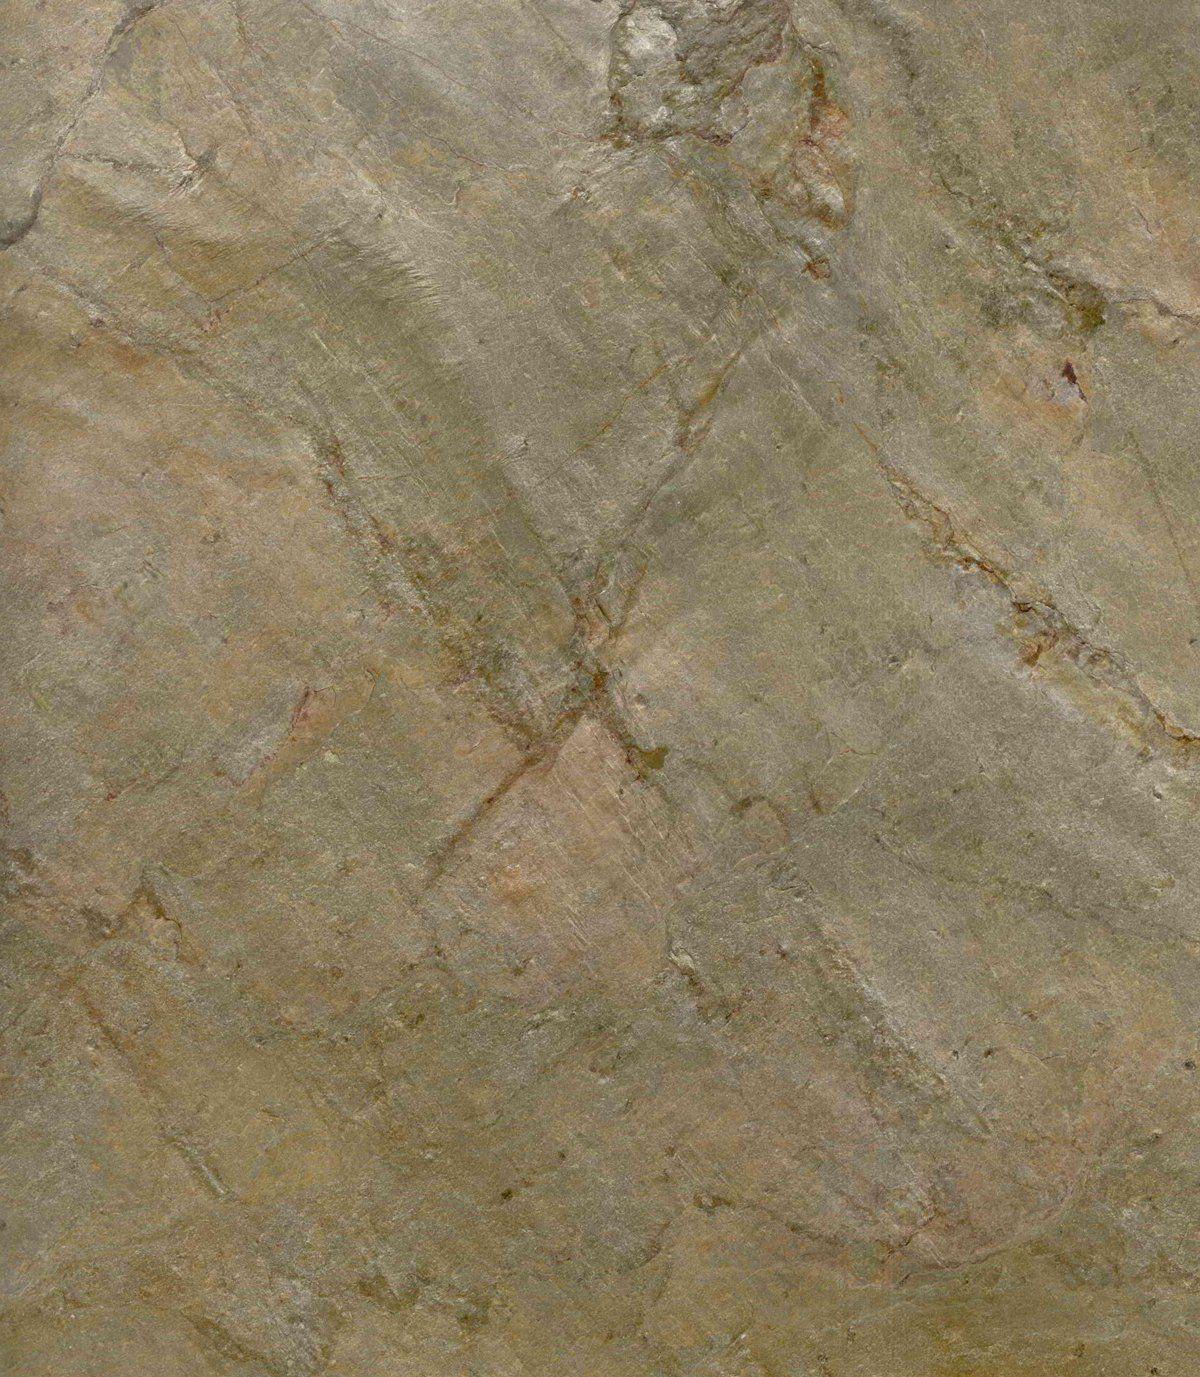 Aspect 6 x 24 inch autumn sandstone peel and stick stone backsplash - Ecoslate Peel N Stick Slate Veneer Wall Tile 3 Inch By 6